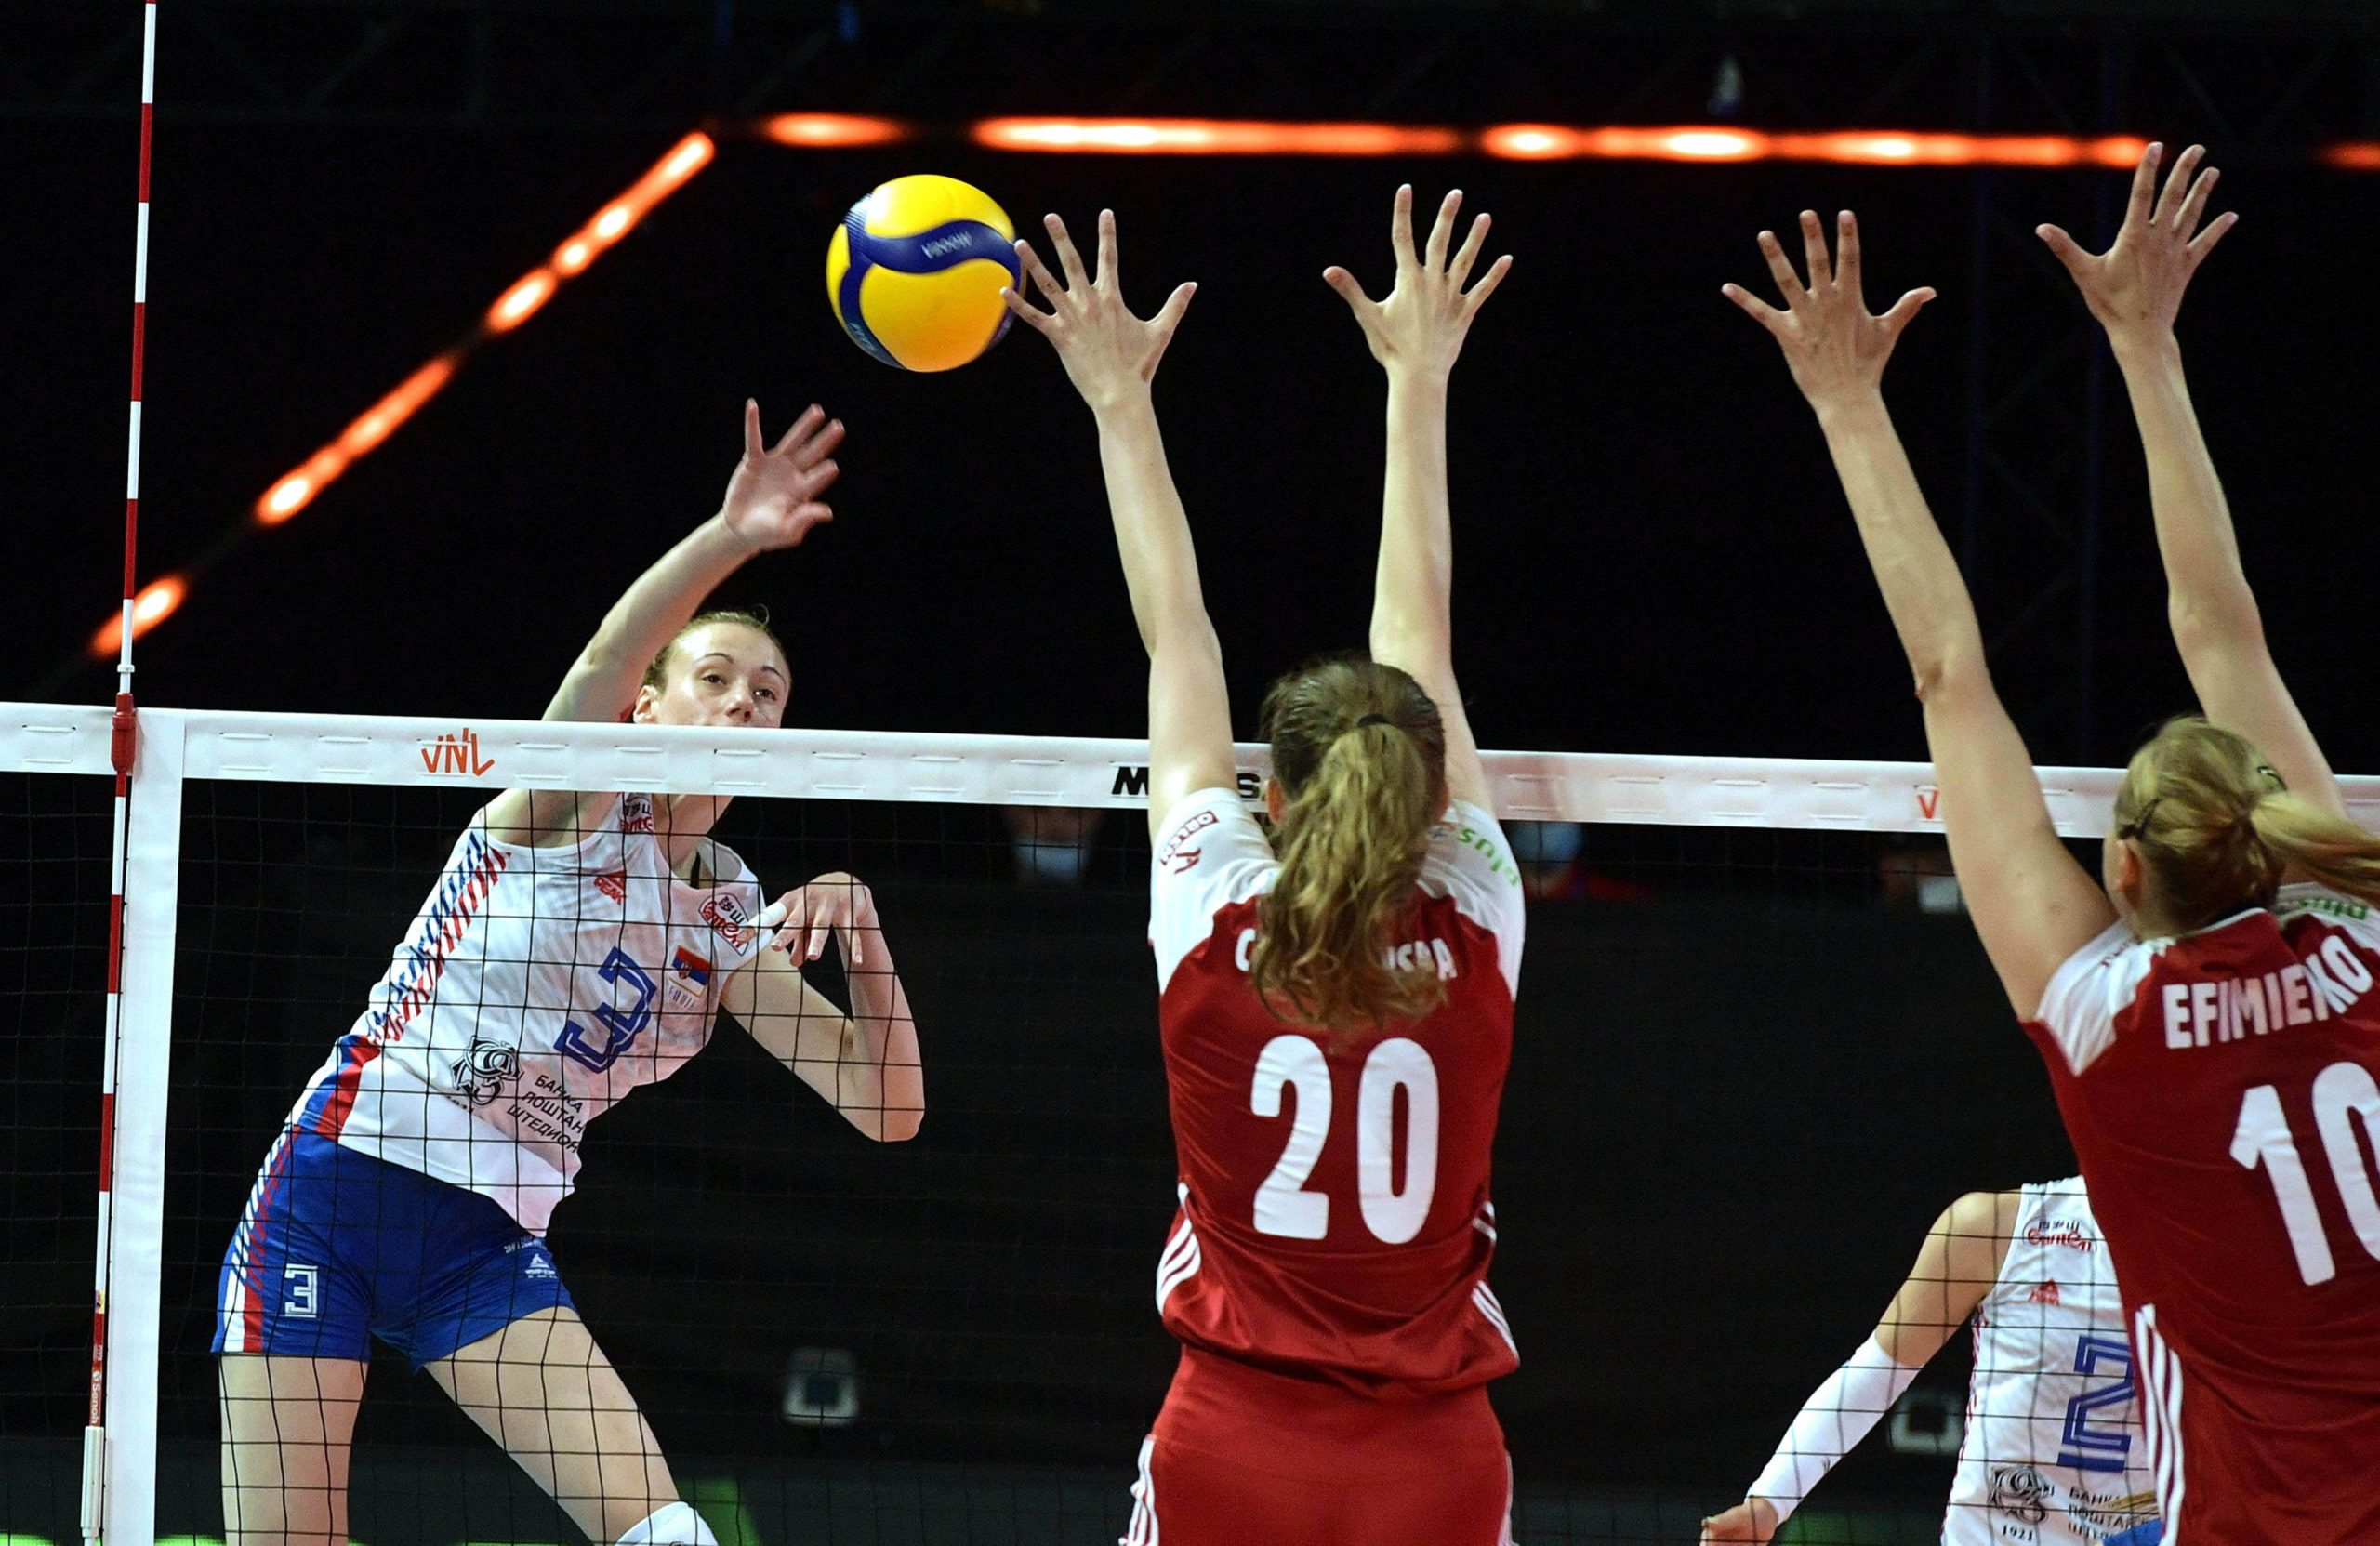 Srbija iznenadila Poljsku i došla do prve pobede